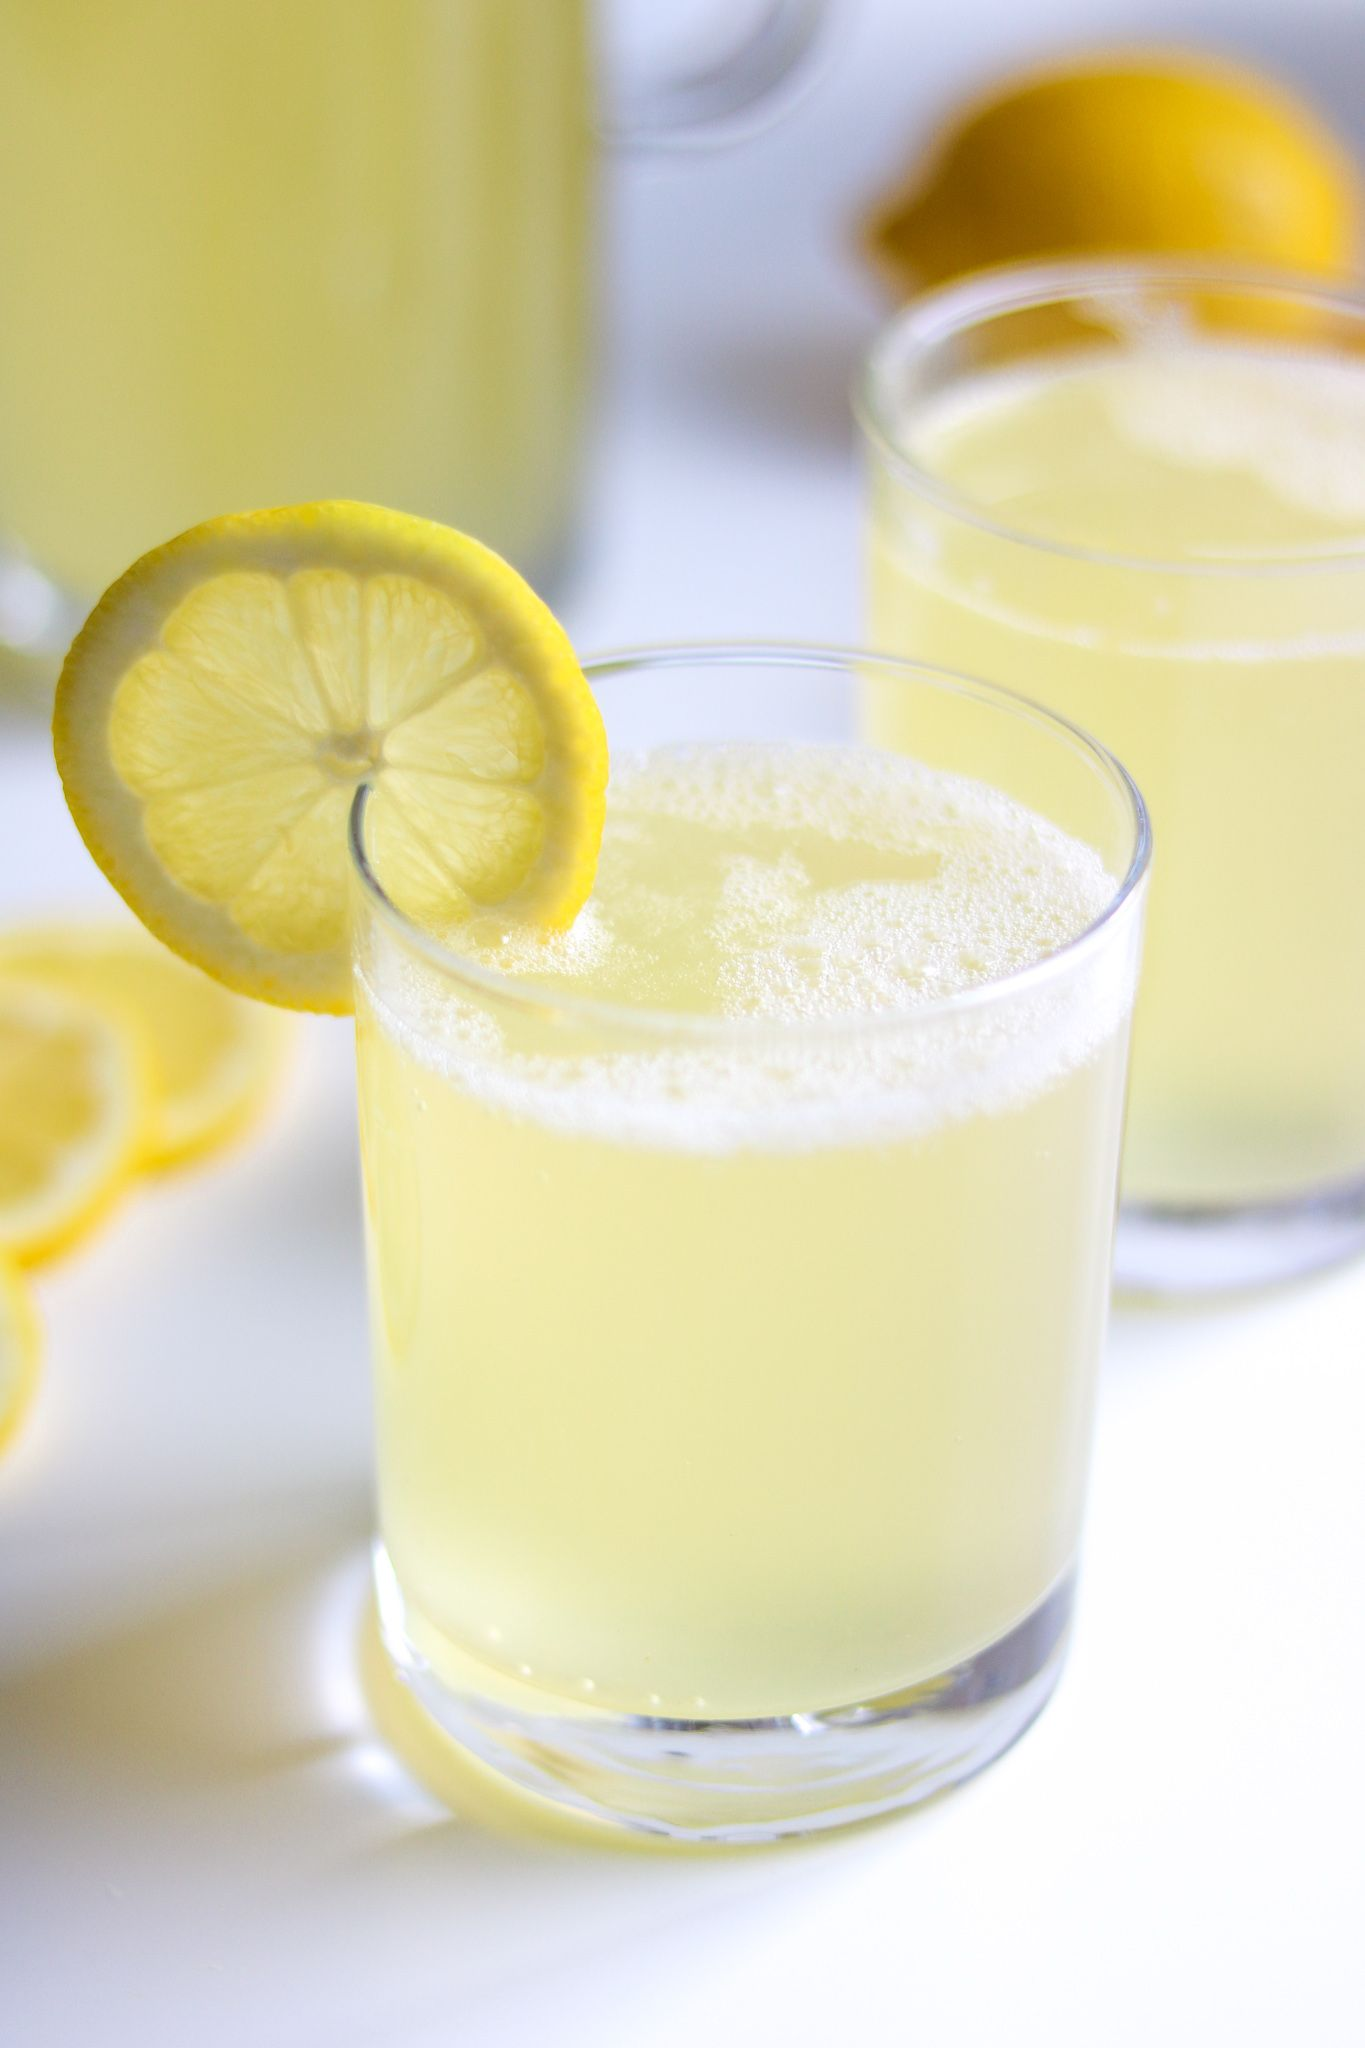 Sparkling Lemonade (Refined Sugar Free) - Simply Jillicious